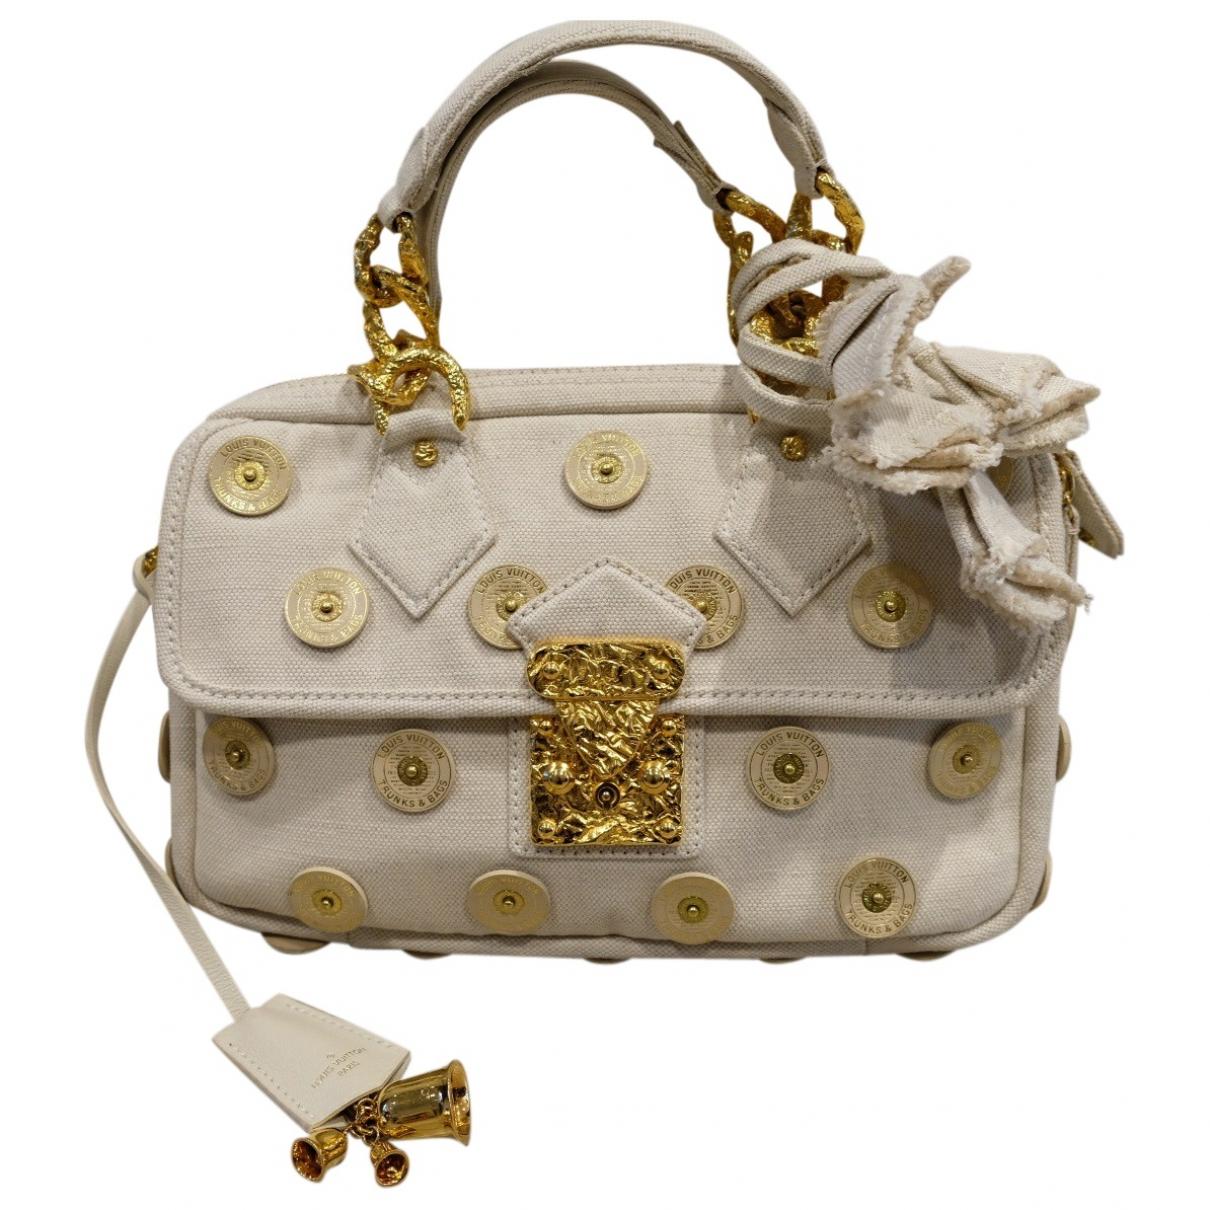 Louis Vuitton \N White Cotton handbag for Women \N